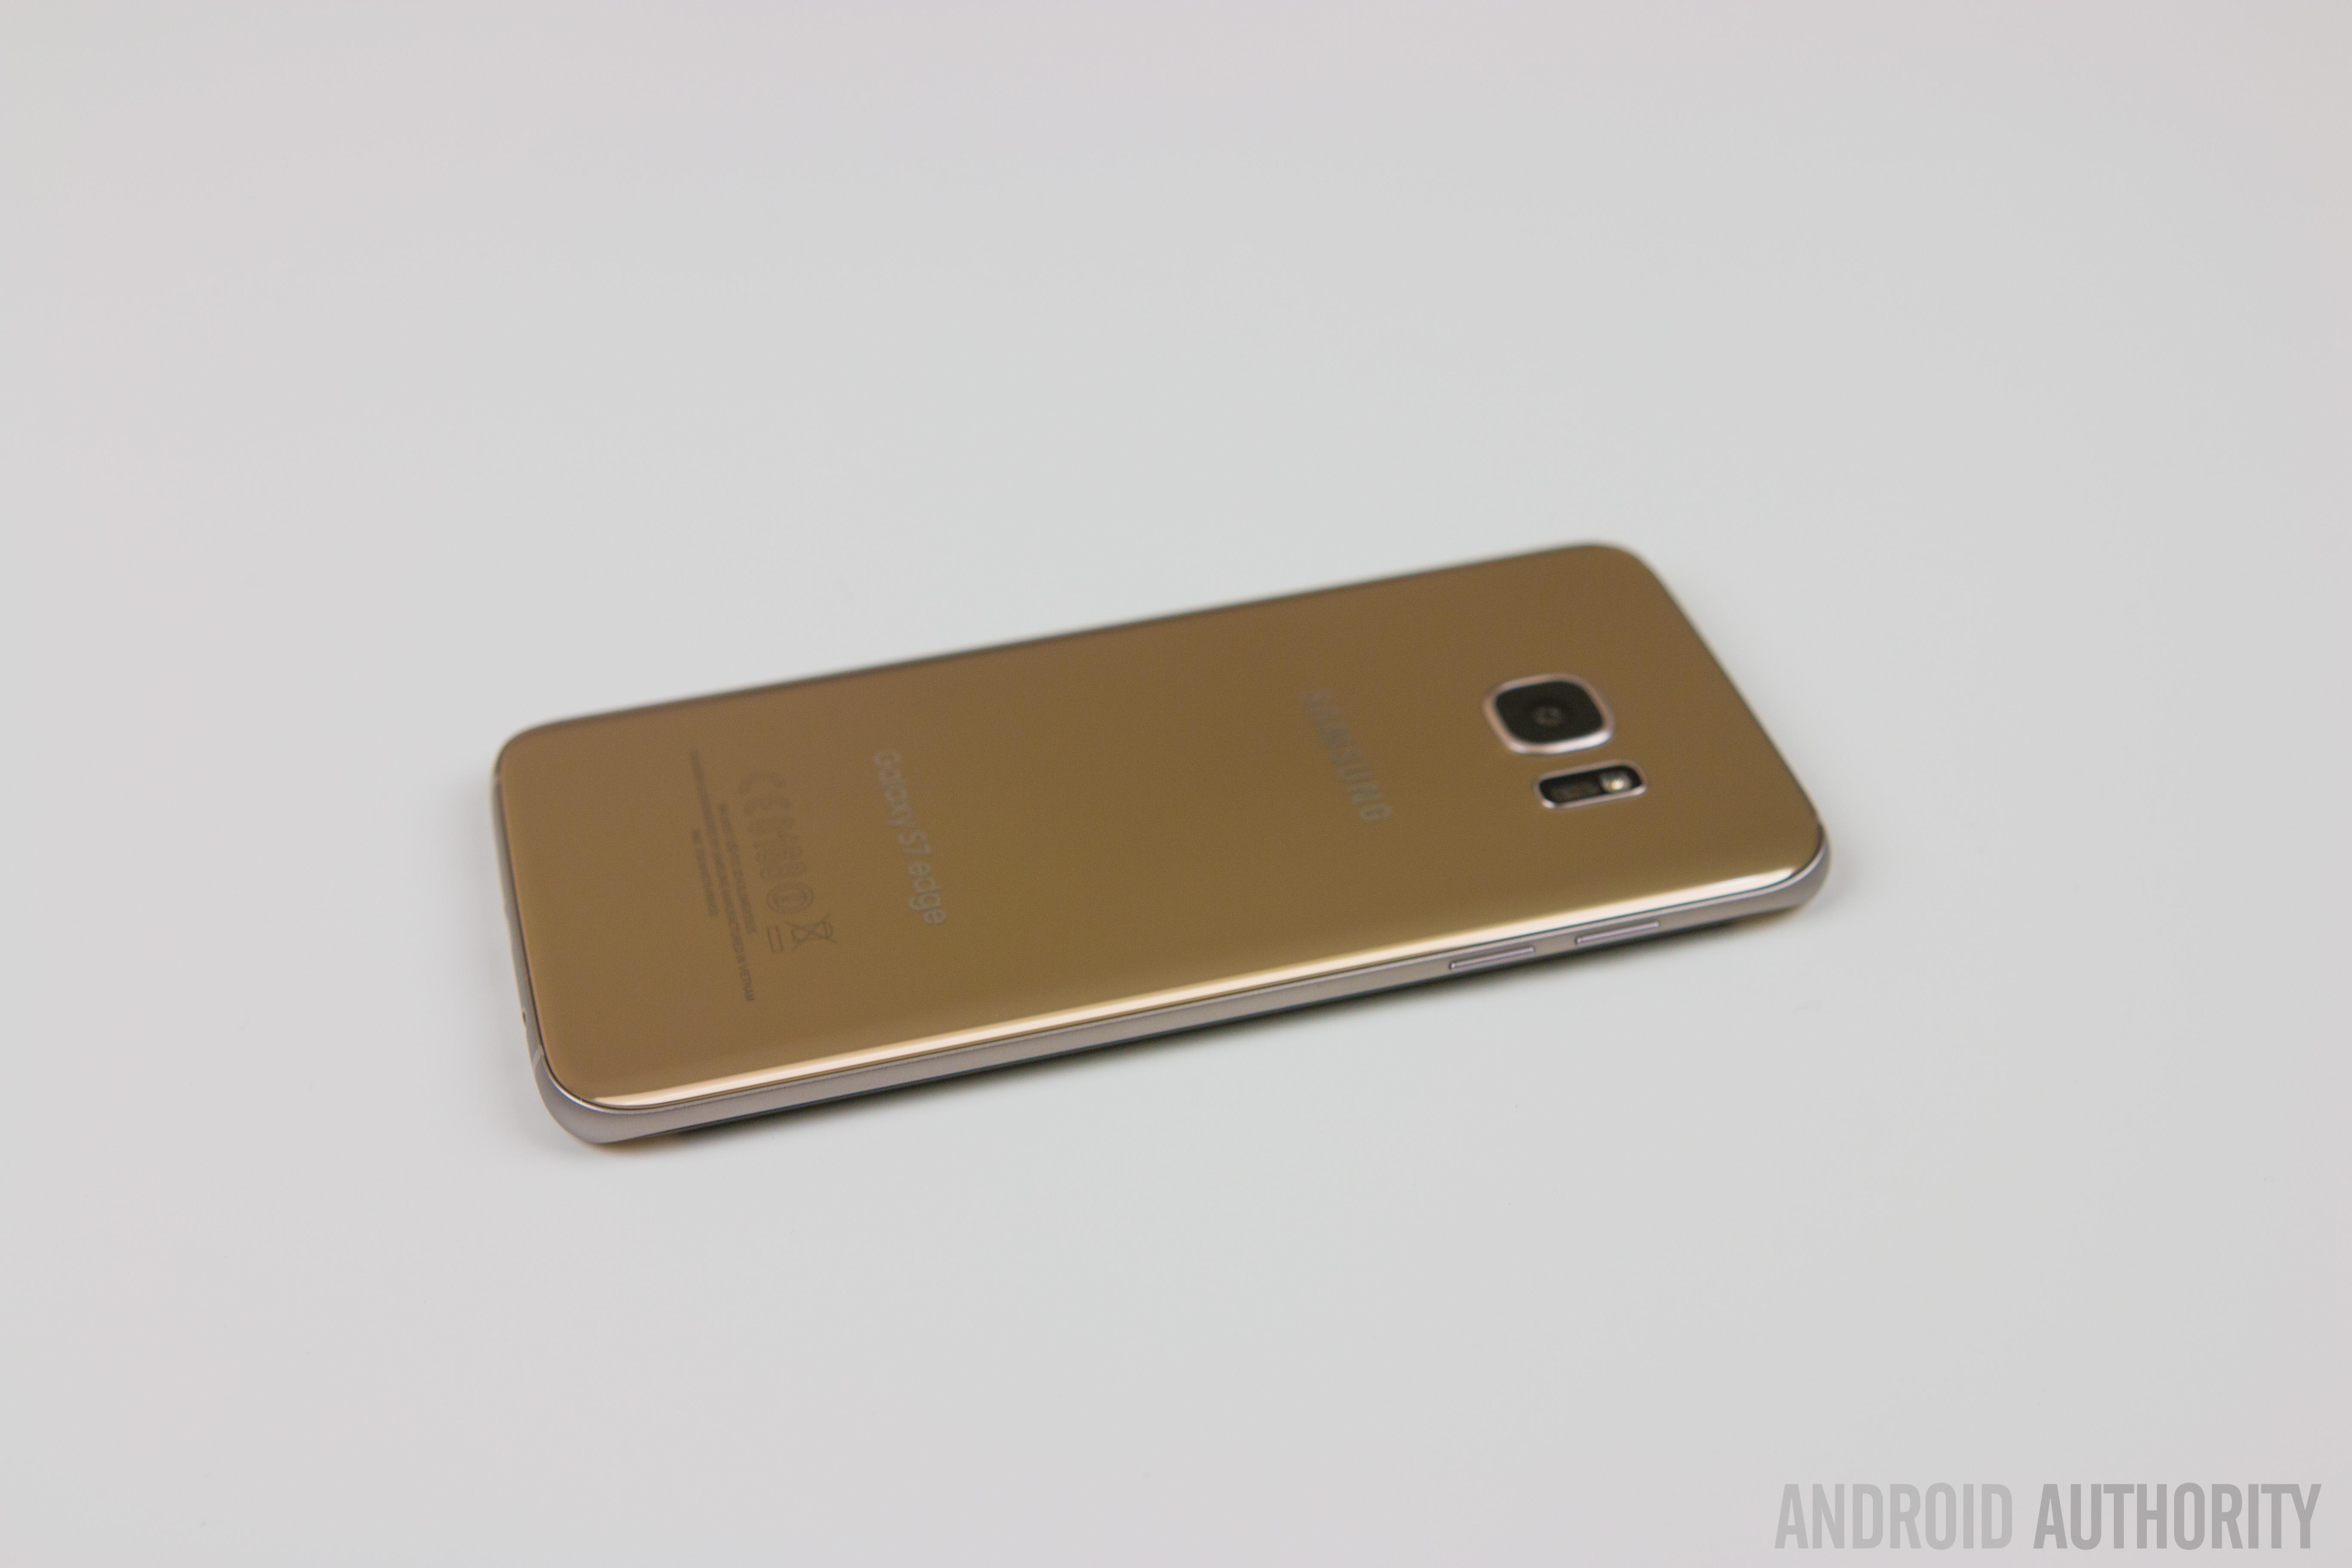 Samsung Galaxy S7 Edge photos-8